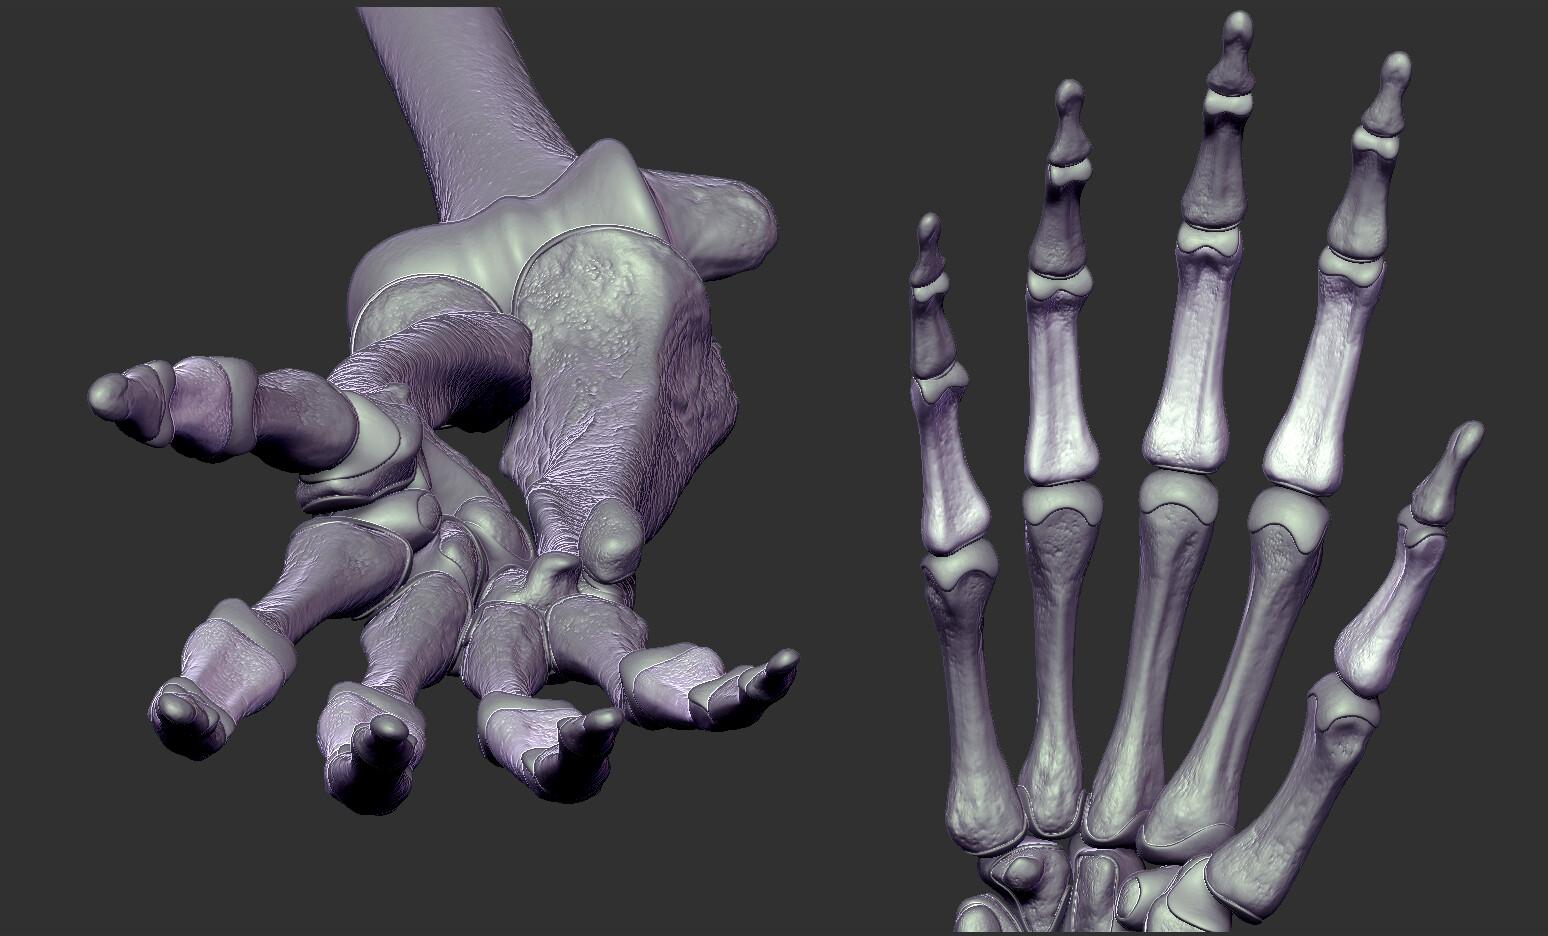 Andrey gritsuk hand 5s